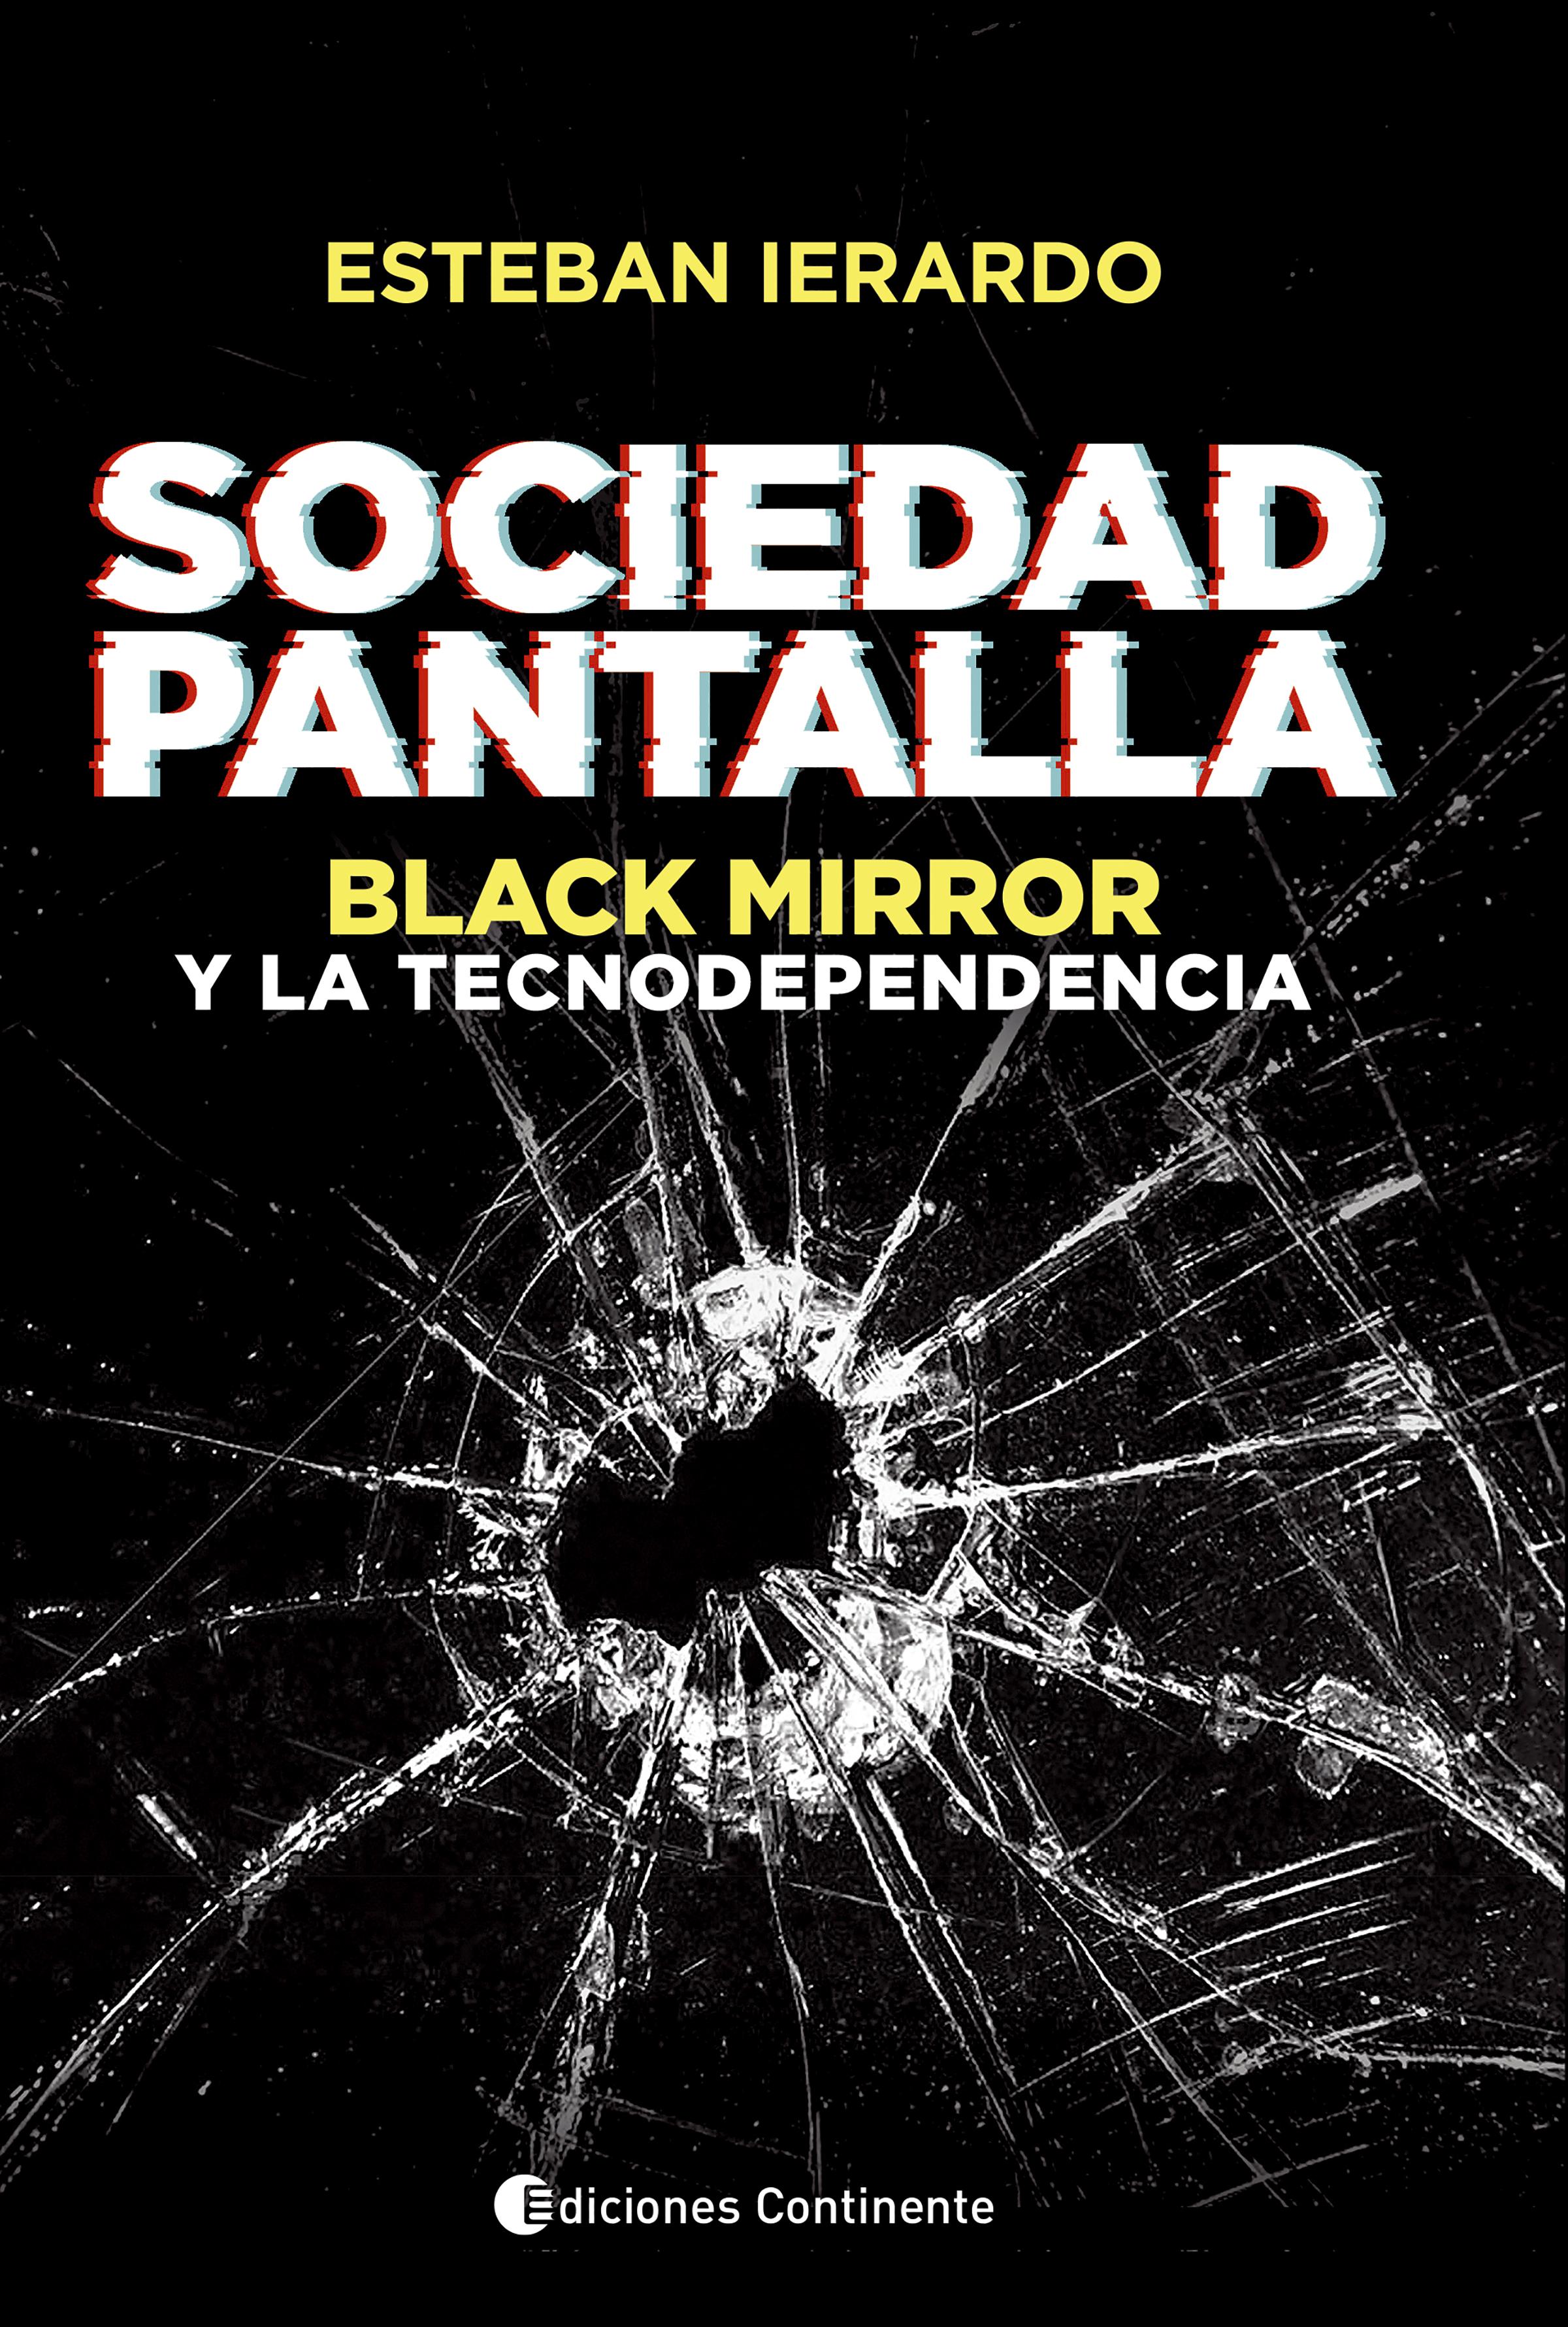 цены Esteban Ierardo Sociedad Pantalla